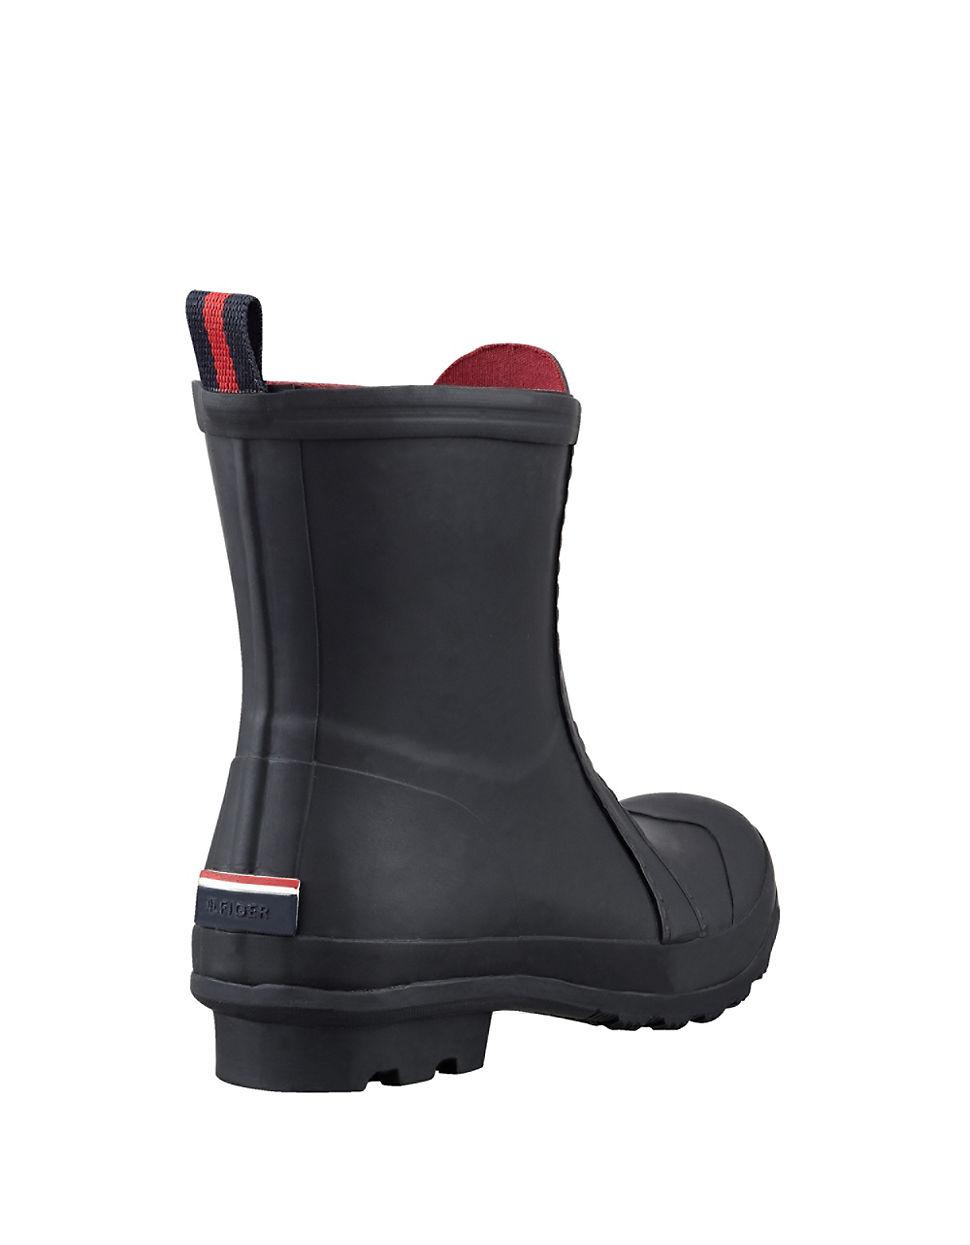 Tommy Hilfiger Rubber Ryann Zip-Up Rain Boot In Black - Lyst-6799